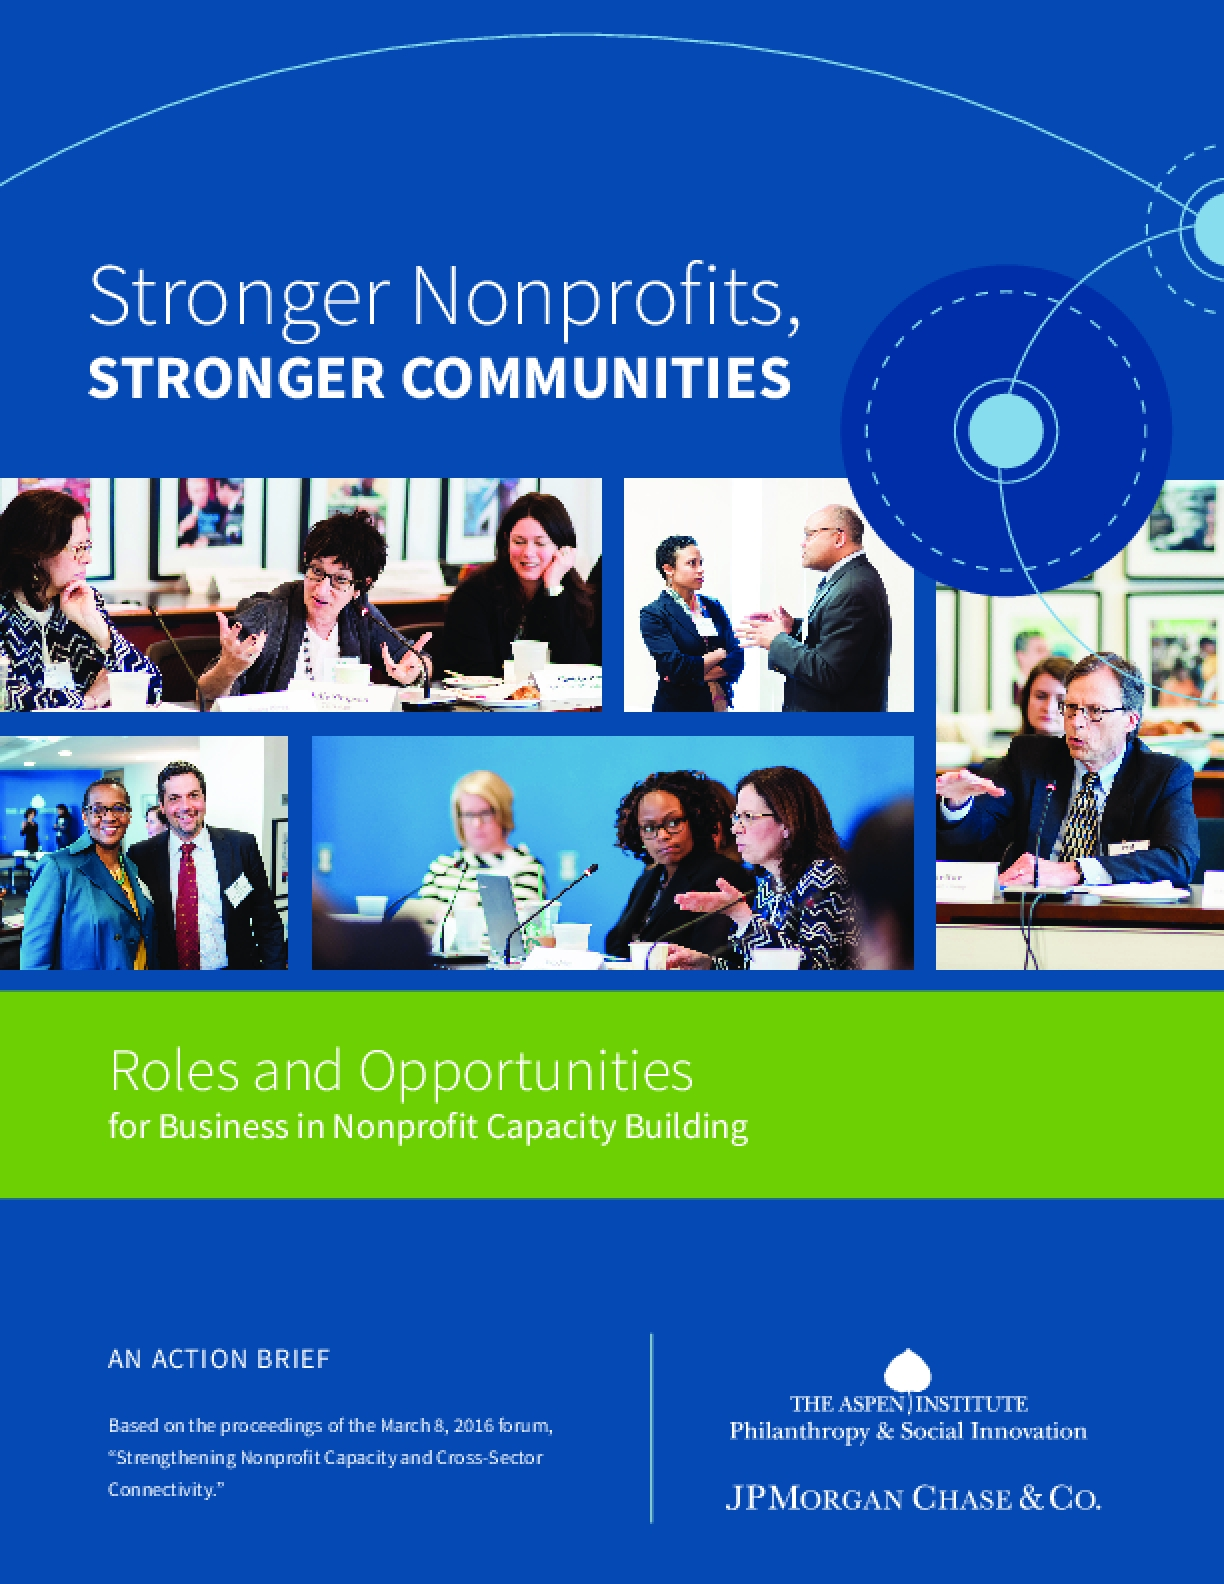 Stronger Nonprofits, Stronger Communities